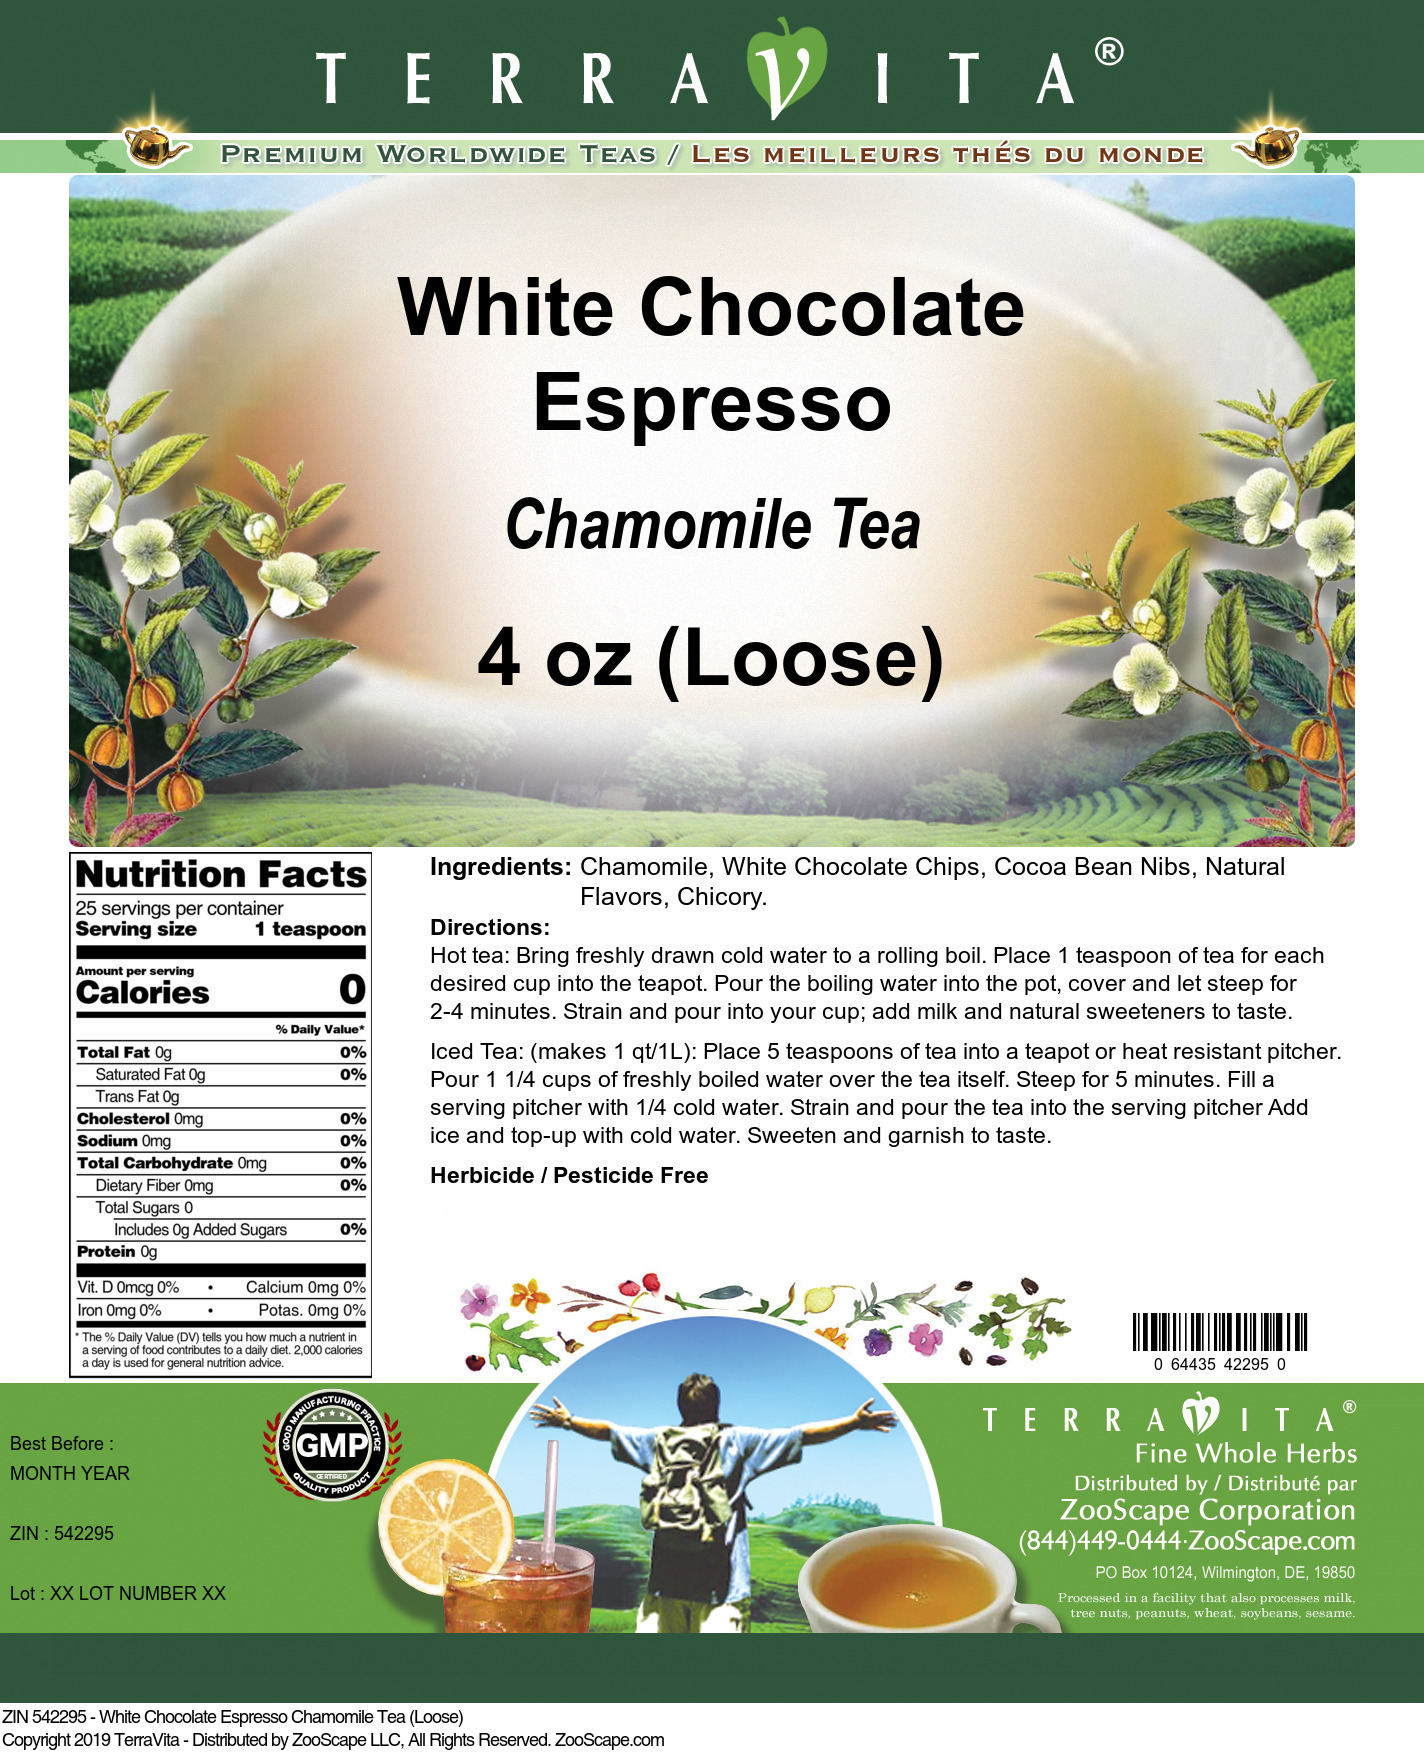 White Chocolate Espresso Chamomile Tea (Loose)